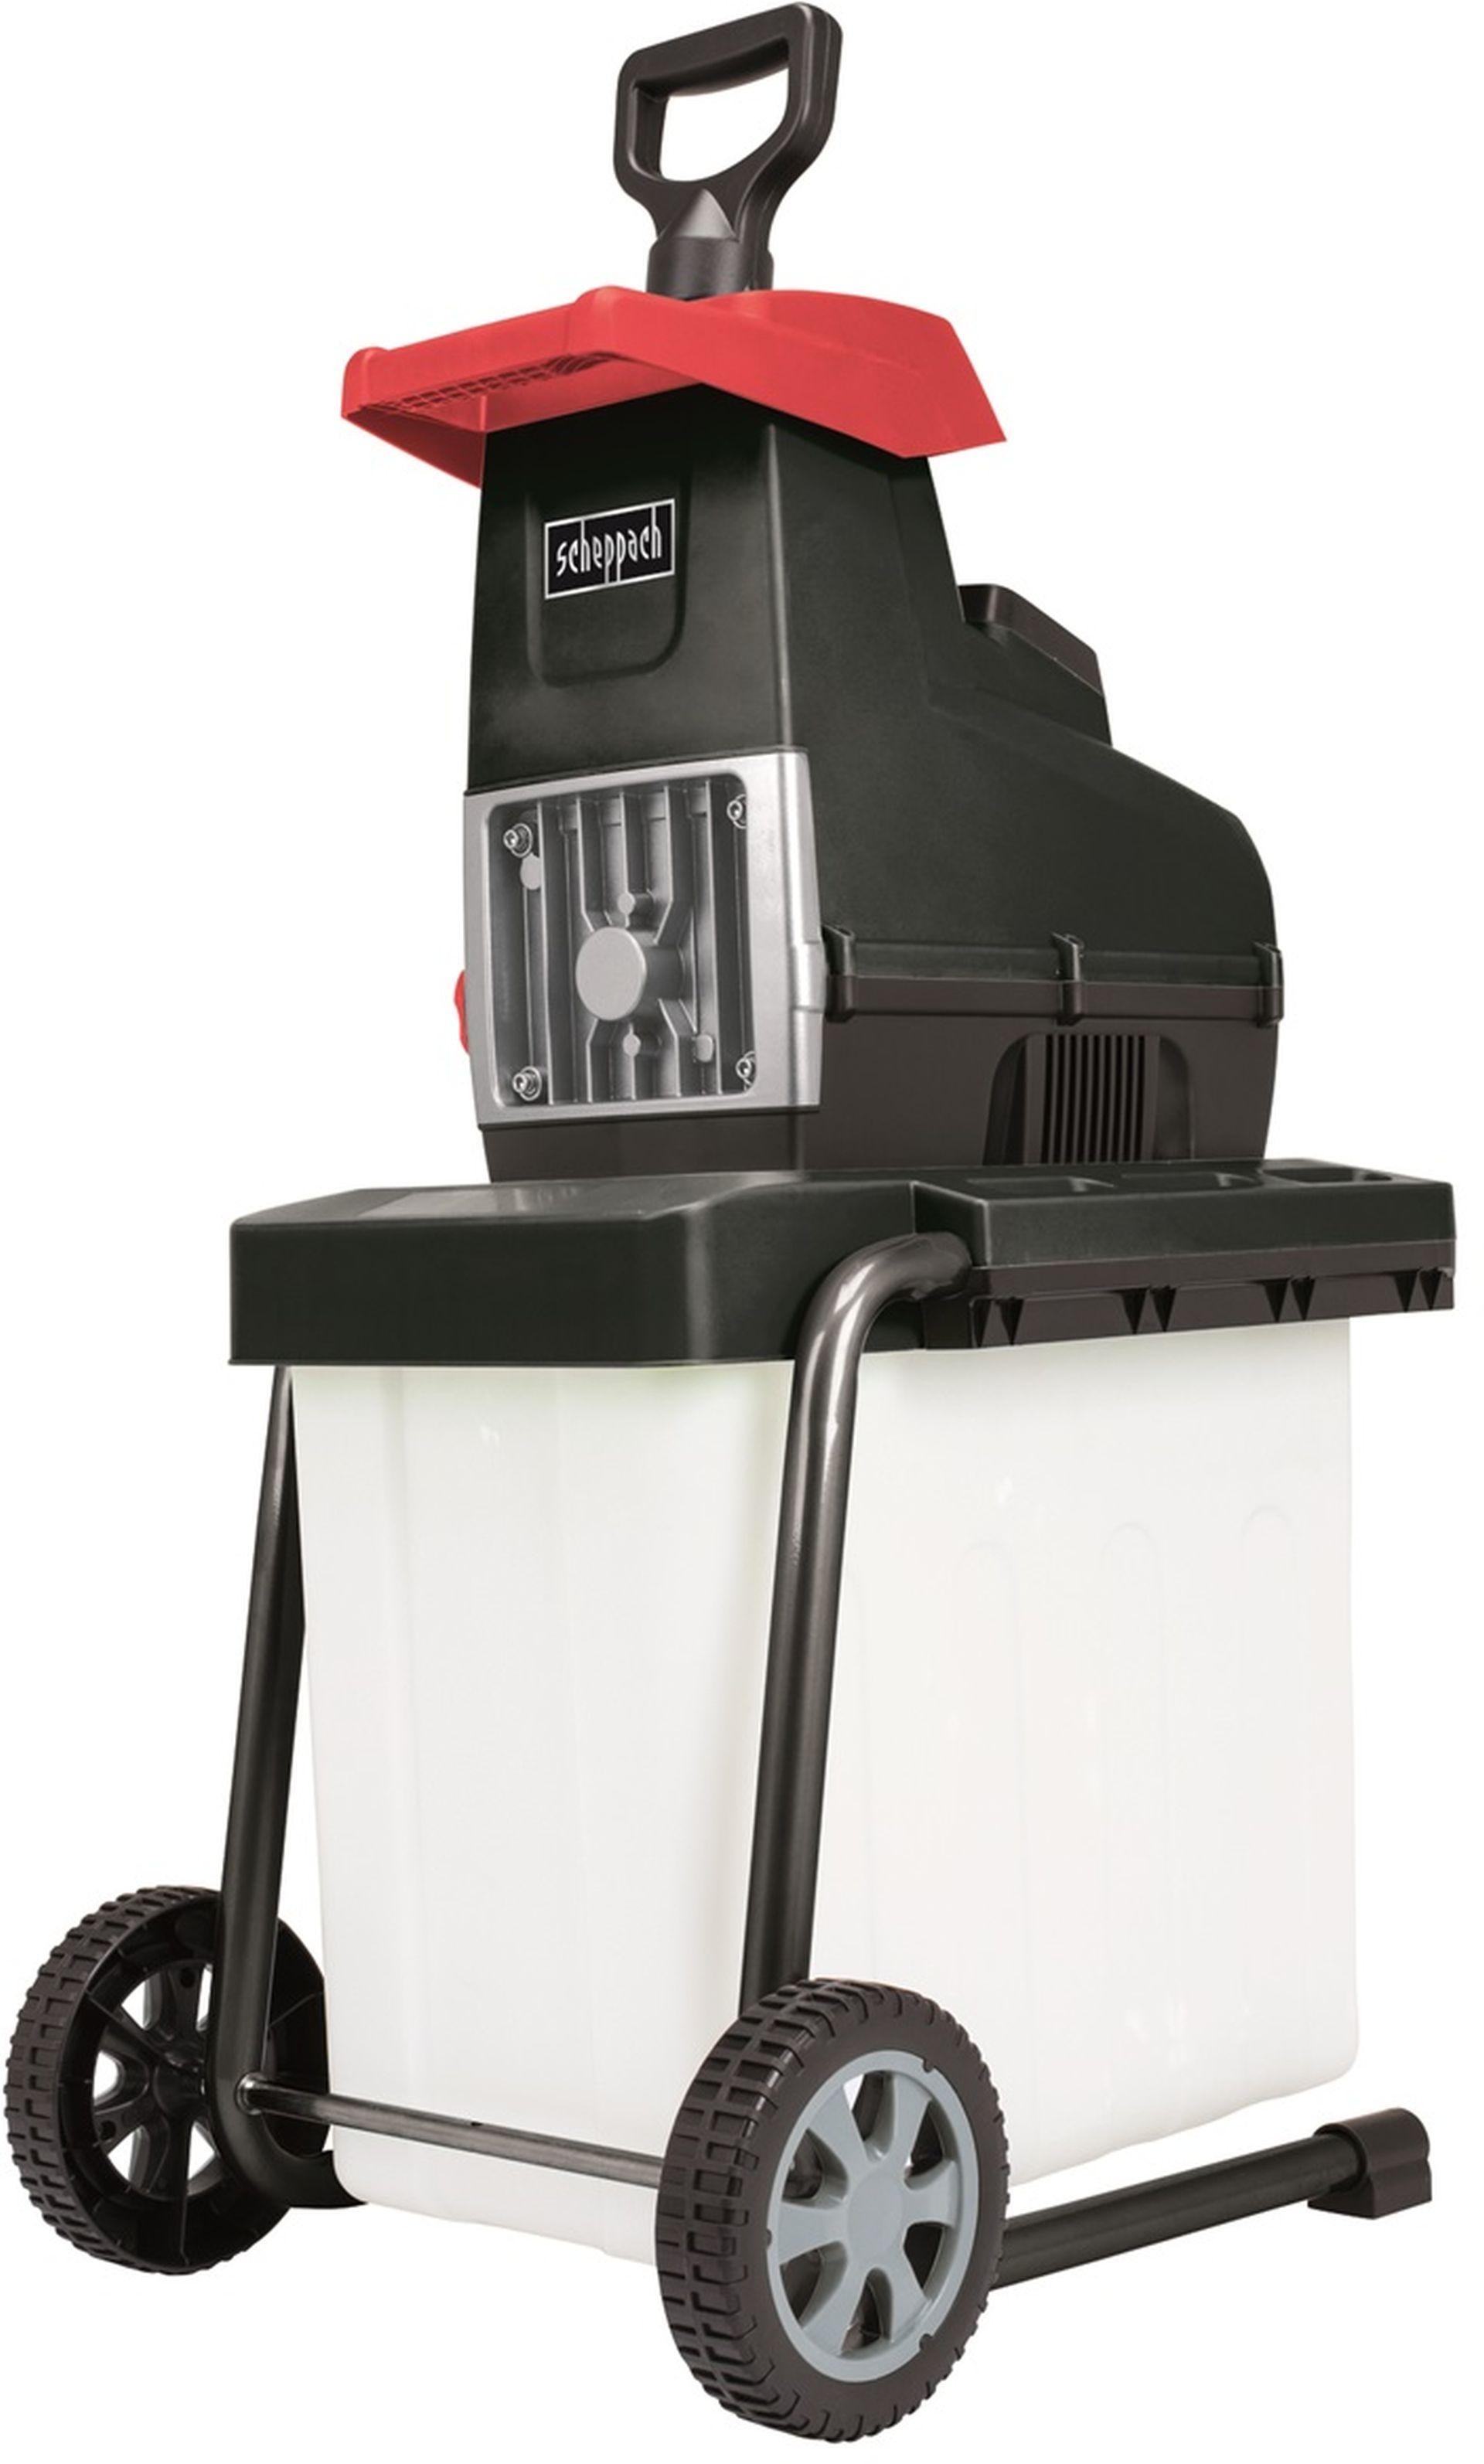 SCHEPPACH GS 60 - elektrický válcový drtič 2800 W s transparentním boxem 5904403901